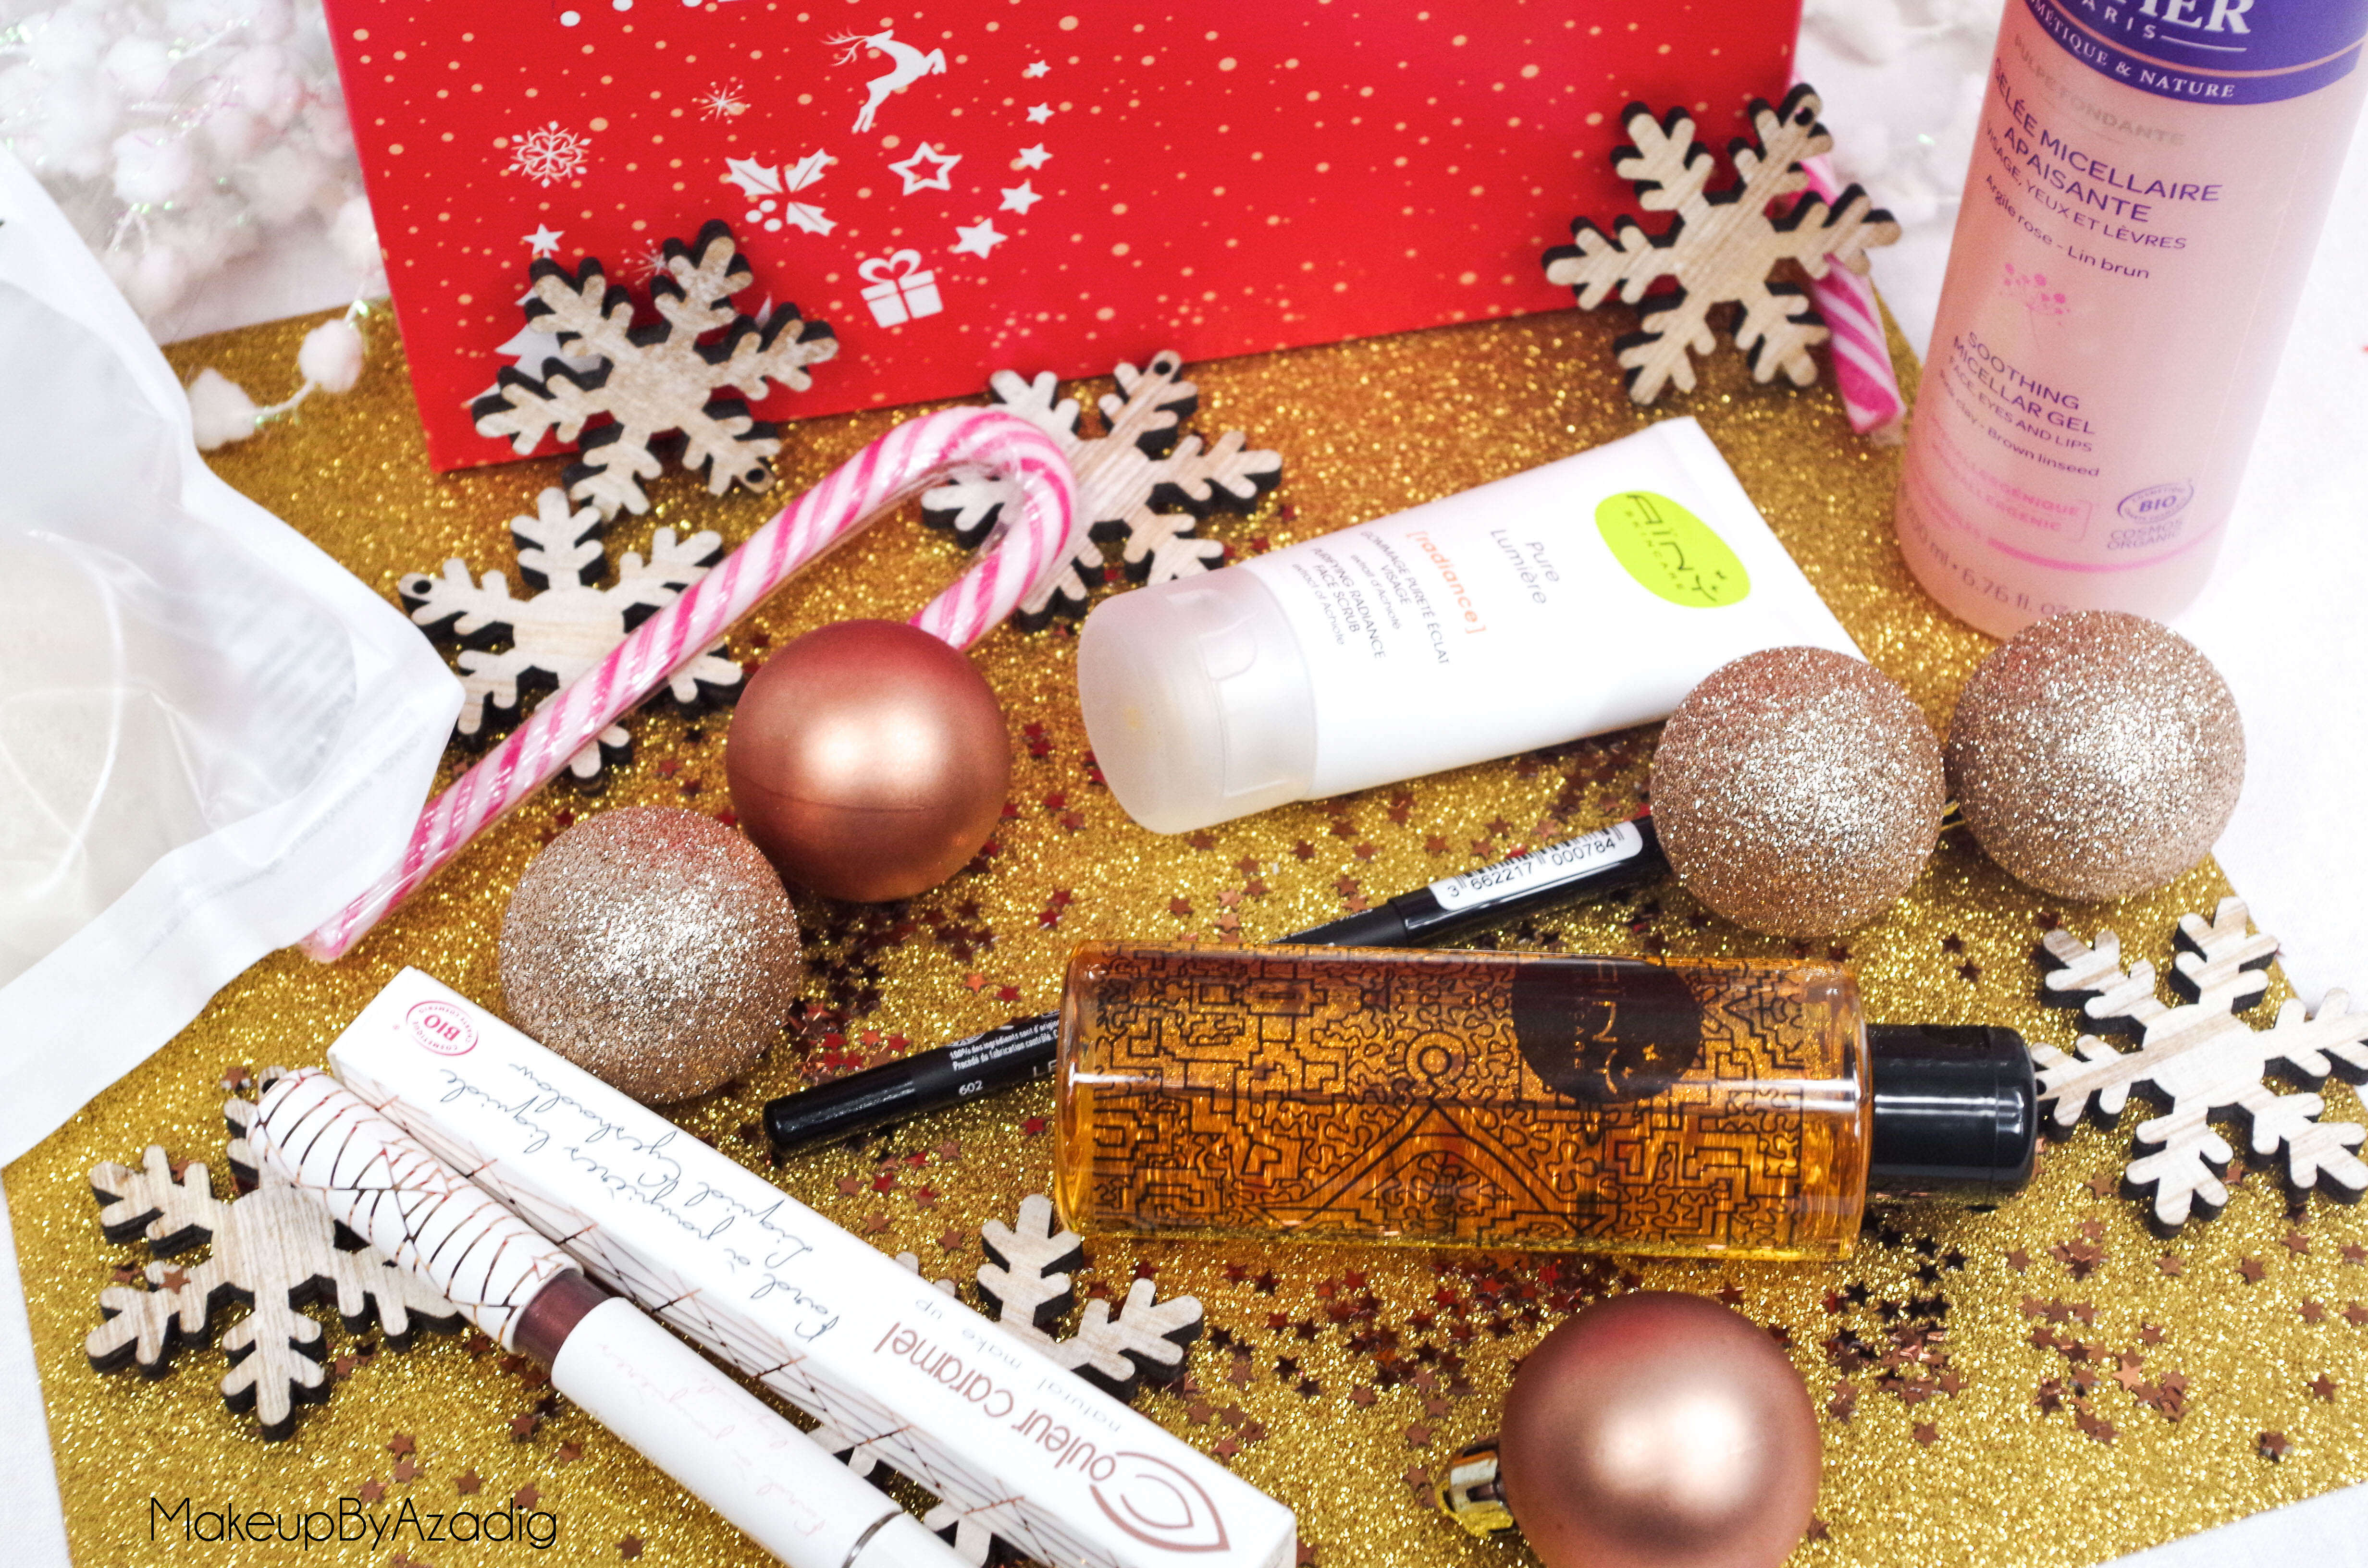 biotyfull-box-beaute-makeupbyazadig-revue-avis-prix-troyes-paris-produits-bio-love